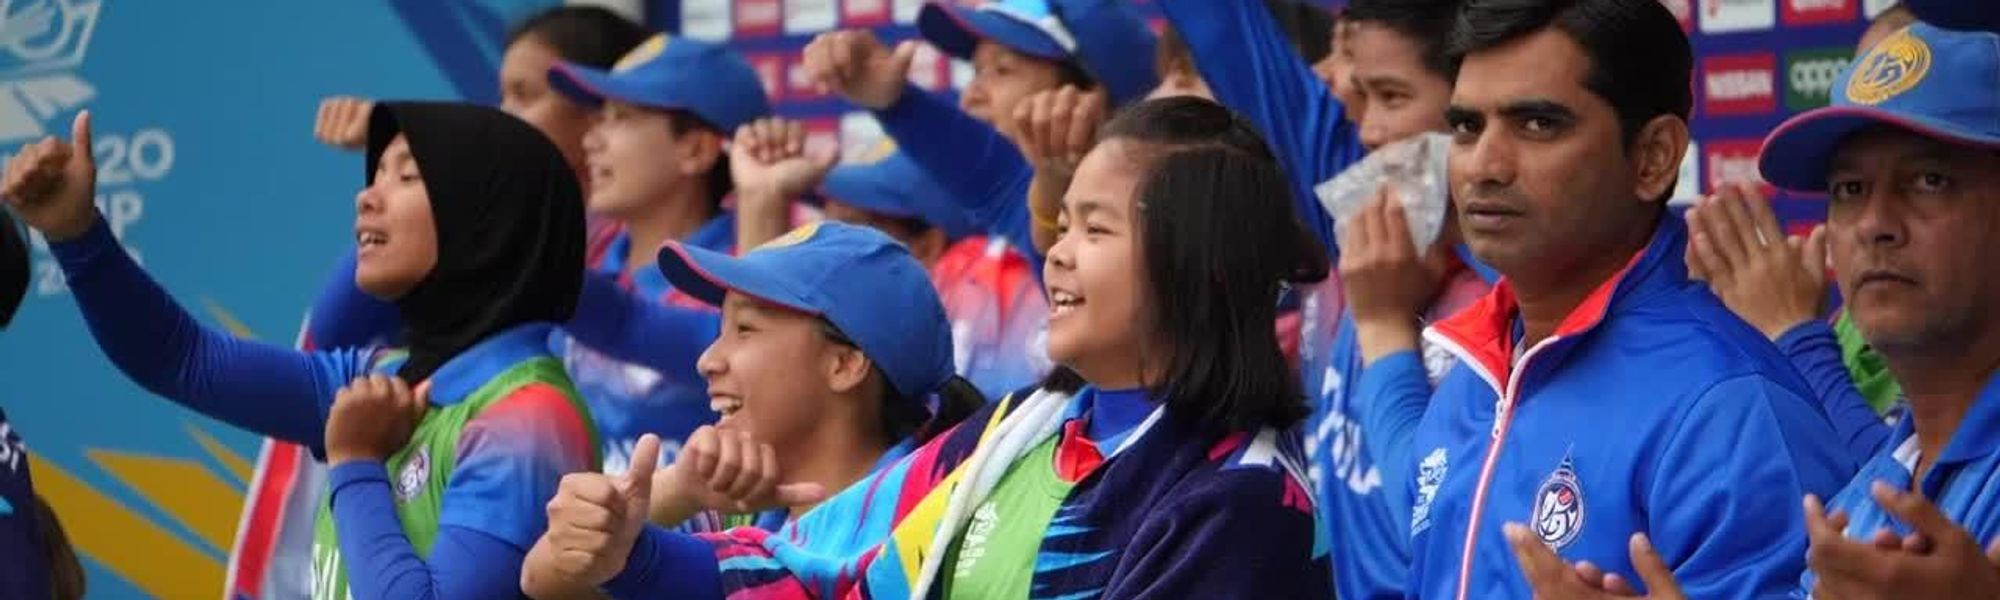 m19-THAILAND 50 MOMENT_Aframe_hd_proxy